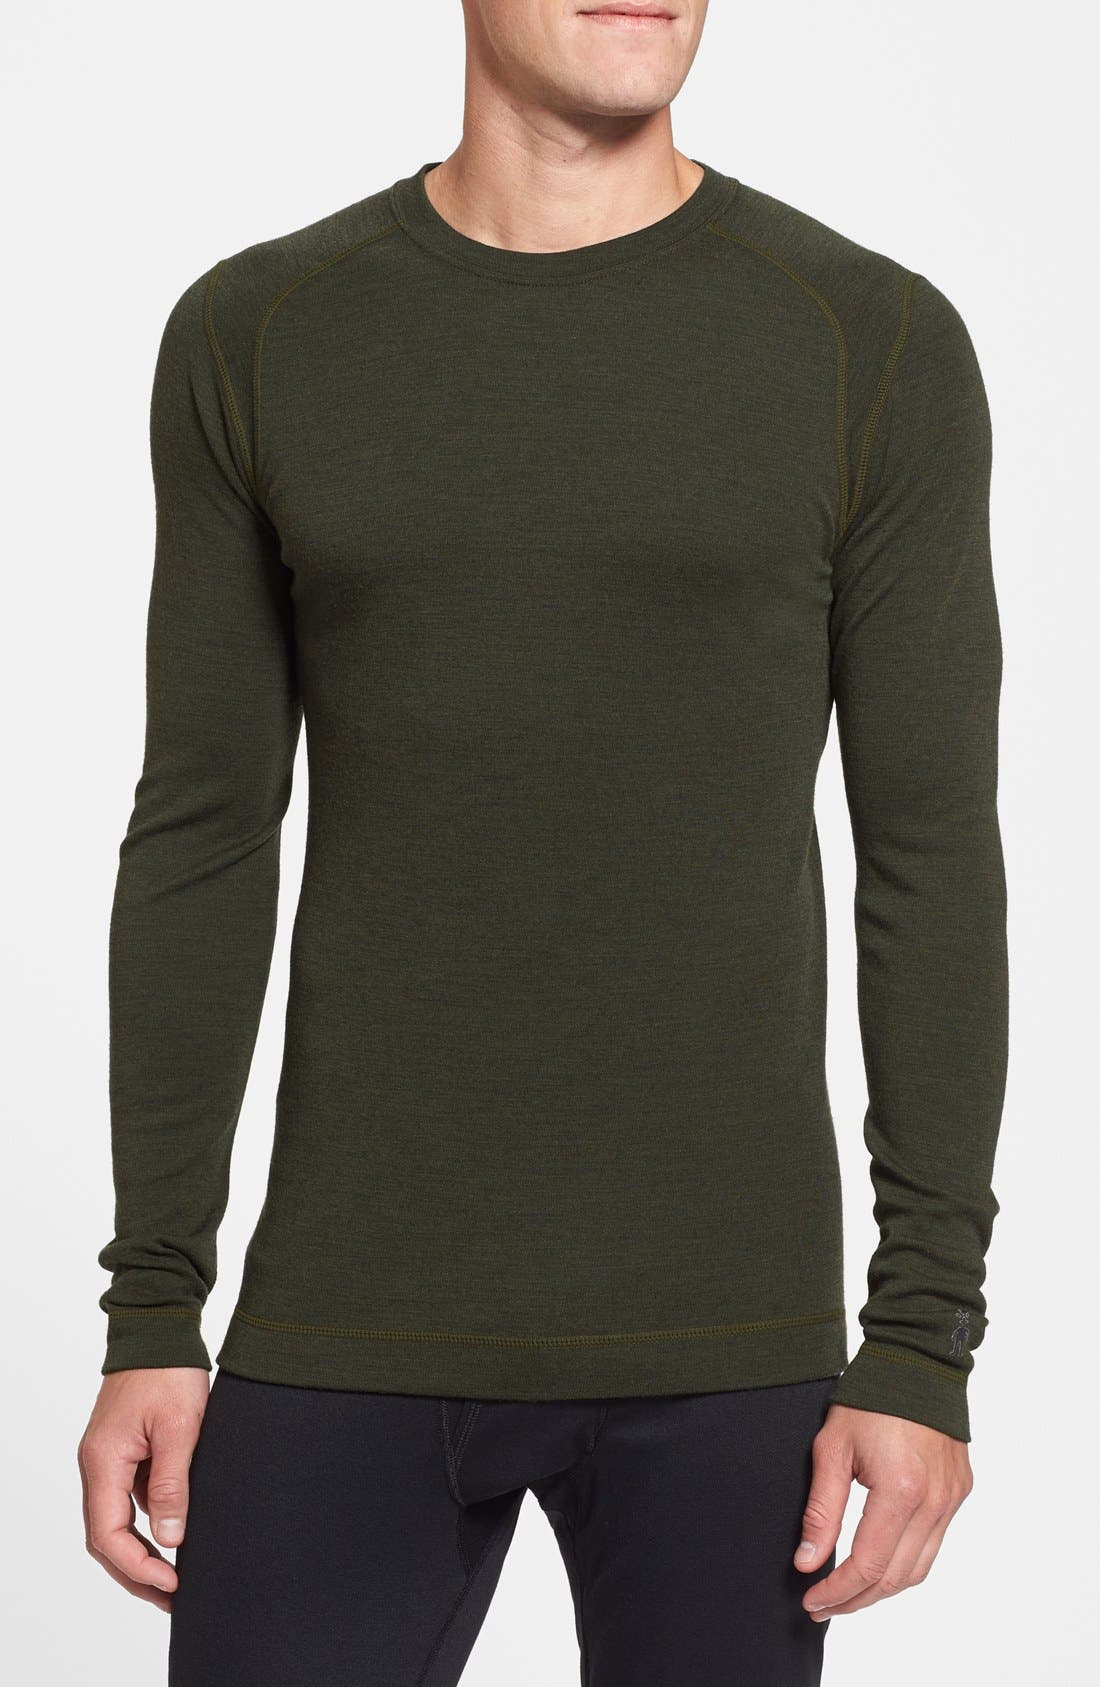 Main Image - Smartwool 'Midweight 250' Base Layer Merino Wool Crewneck Shirt